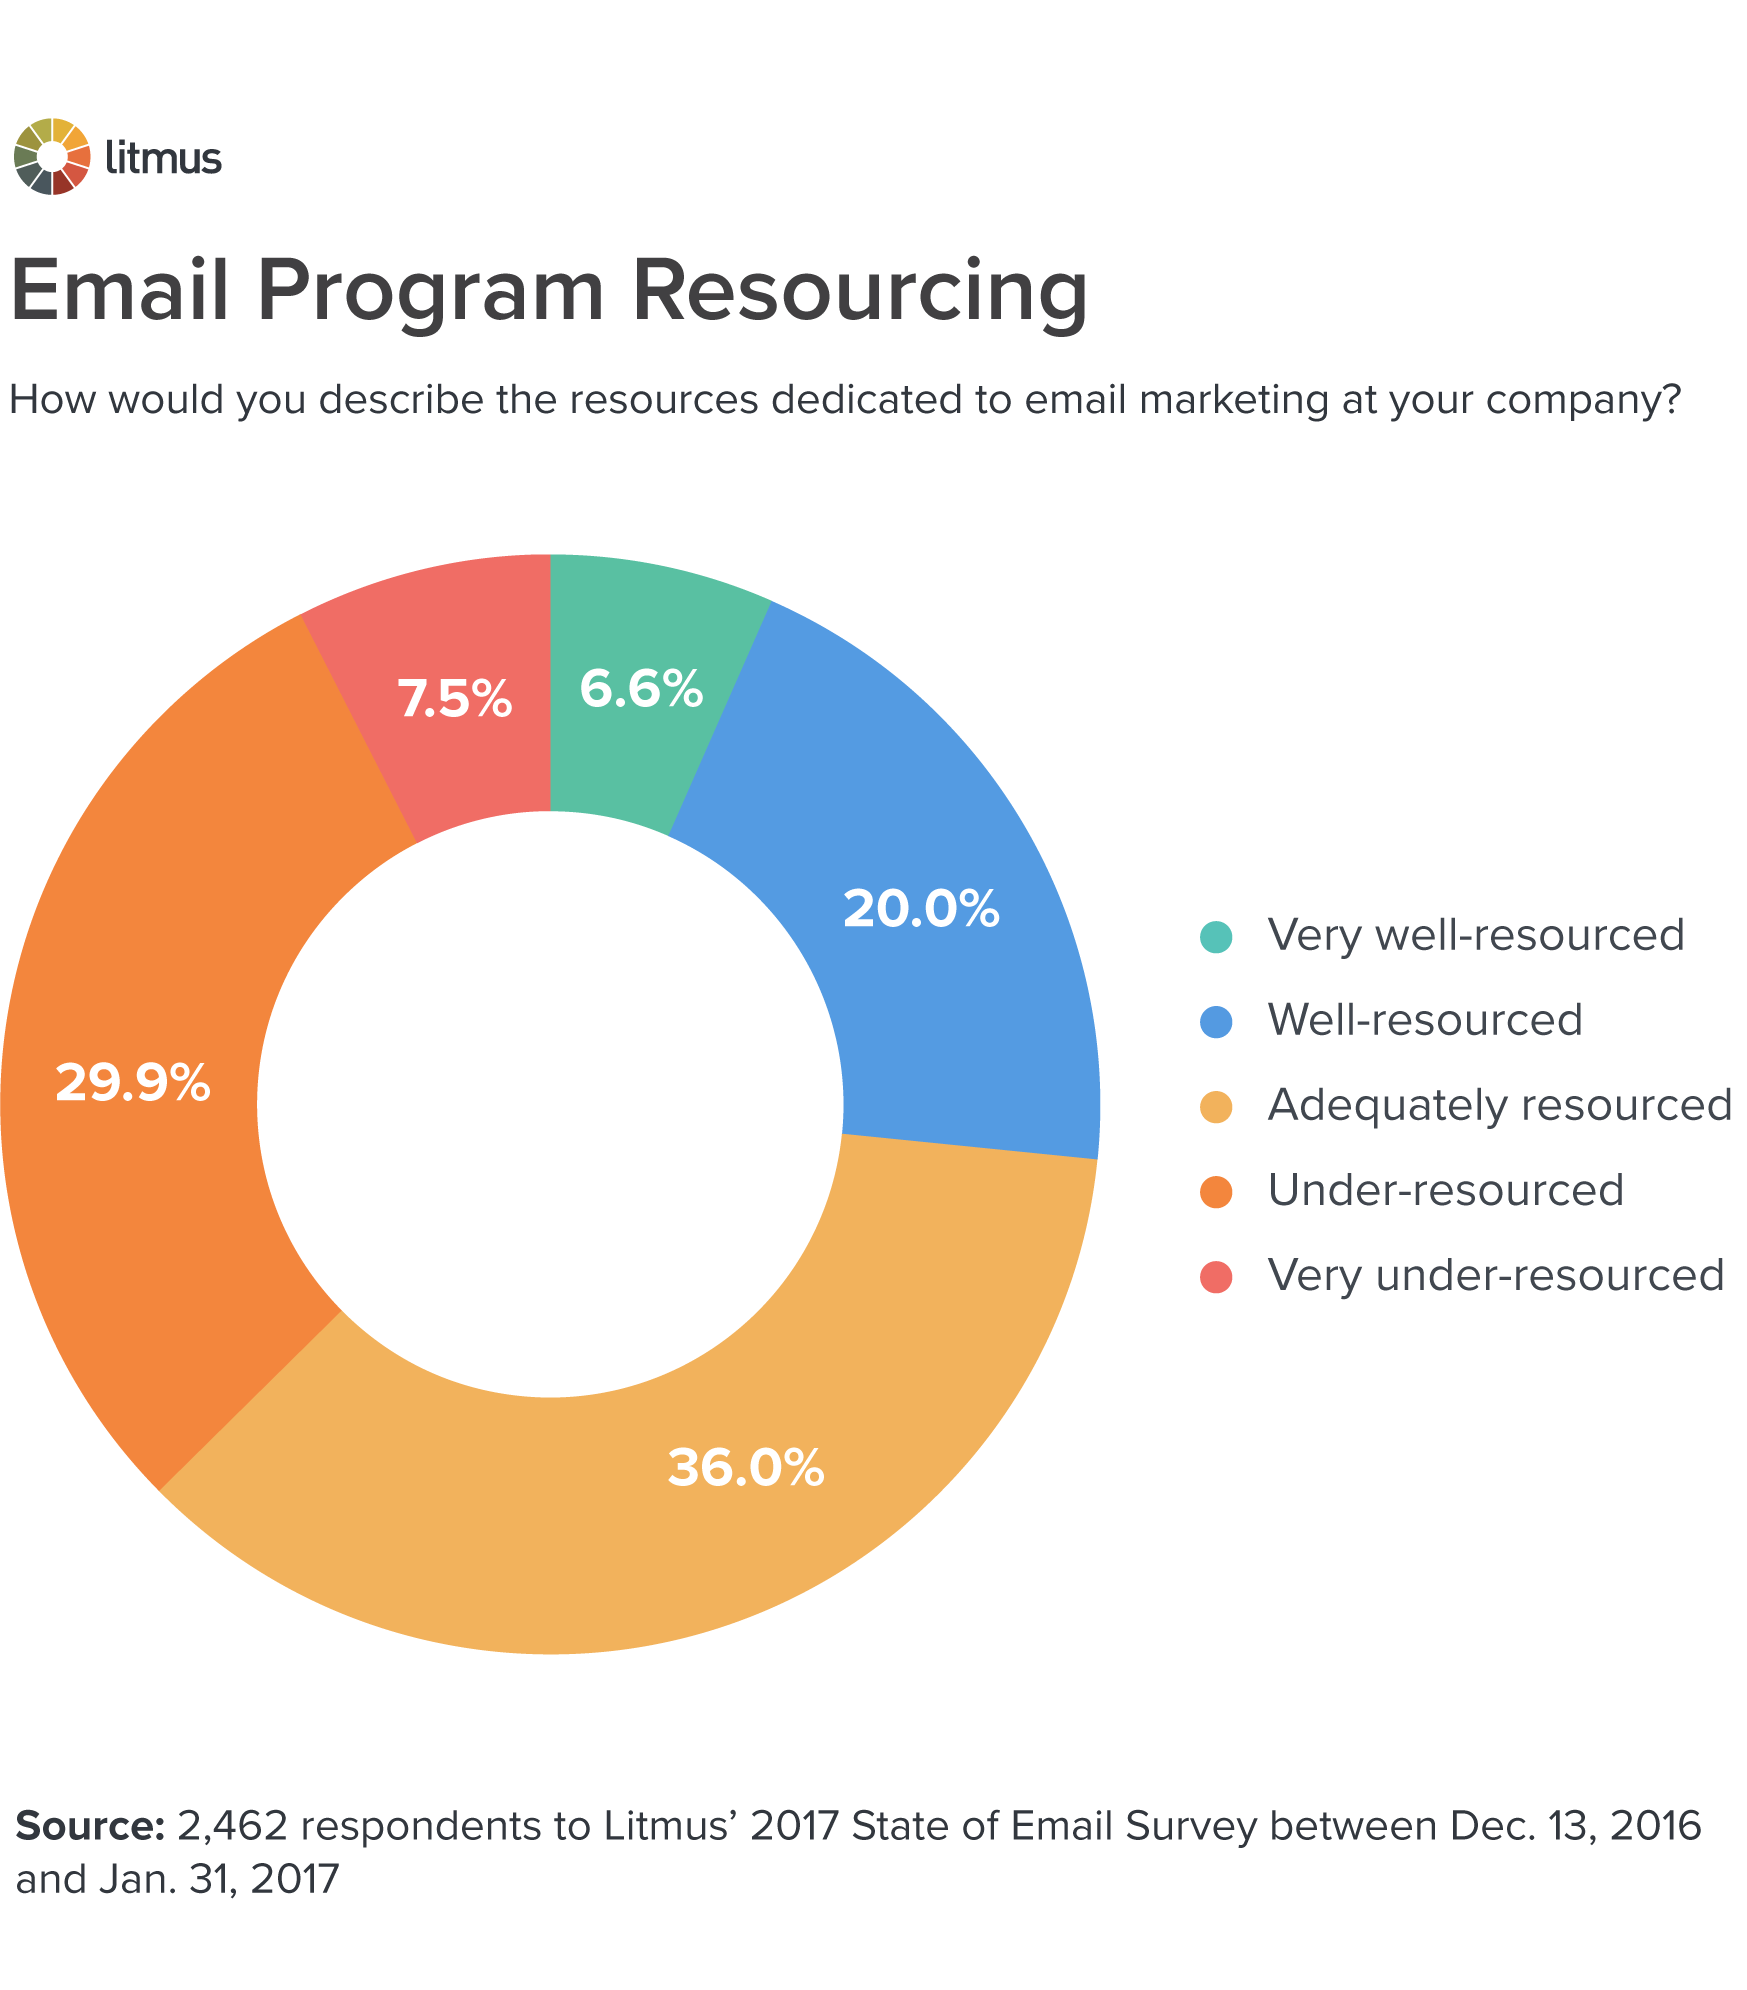 Email Program Resourcing